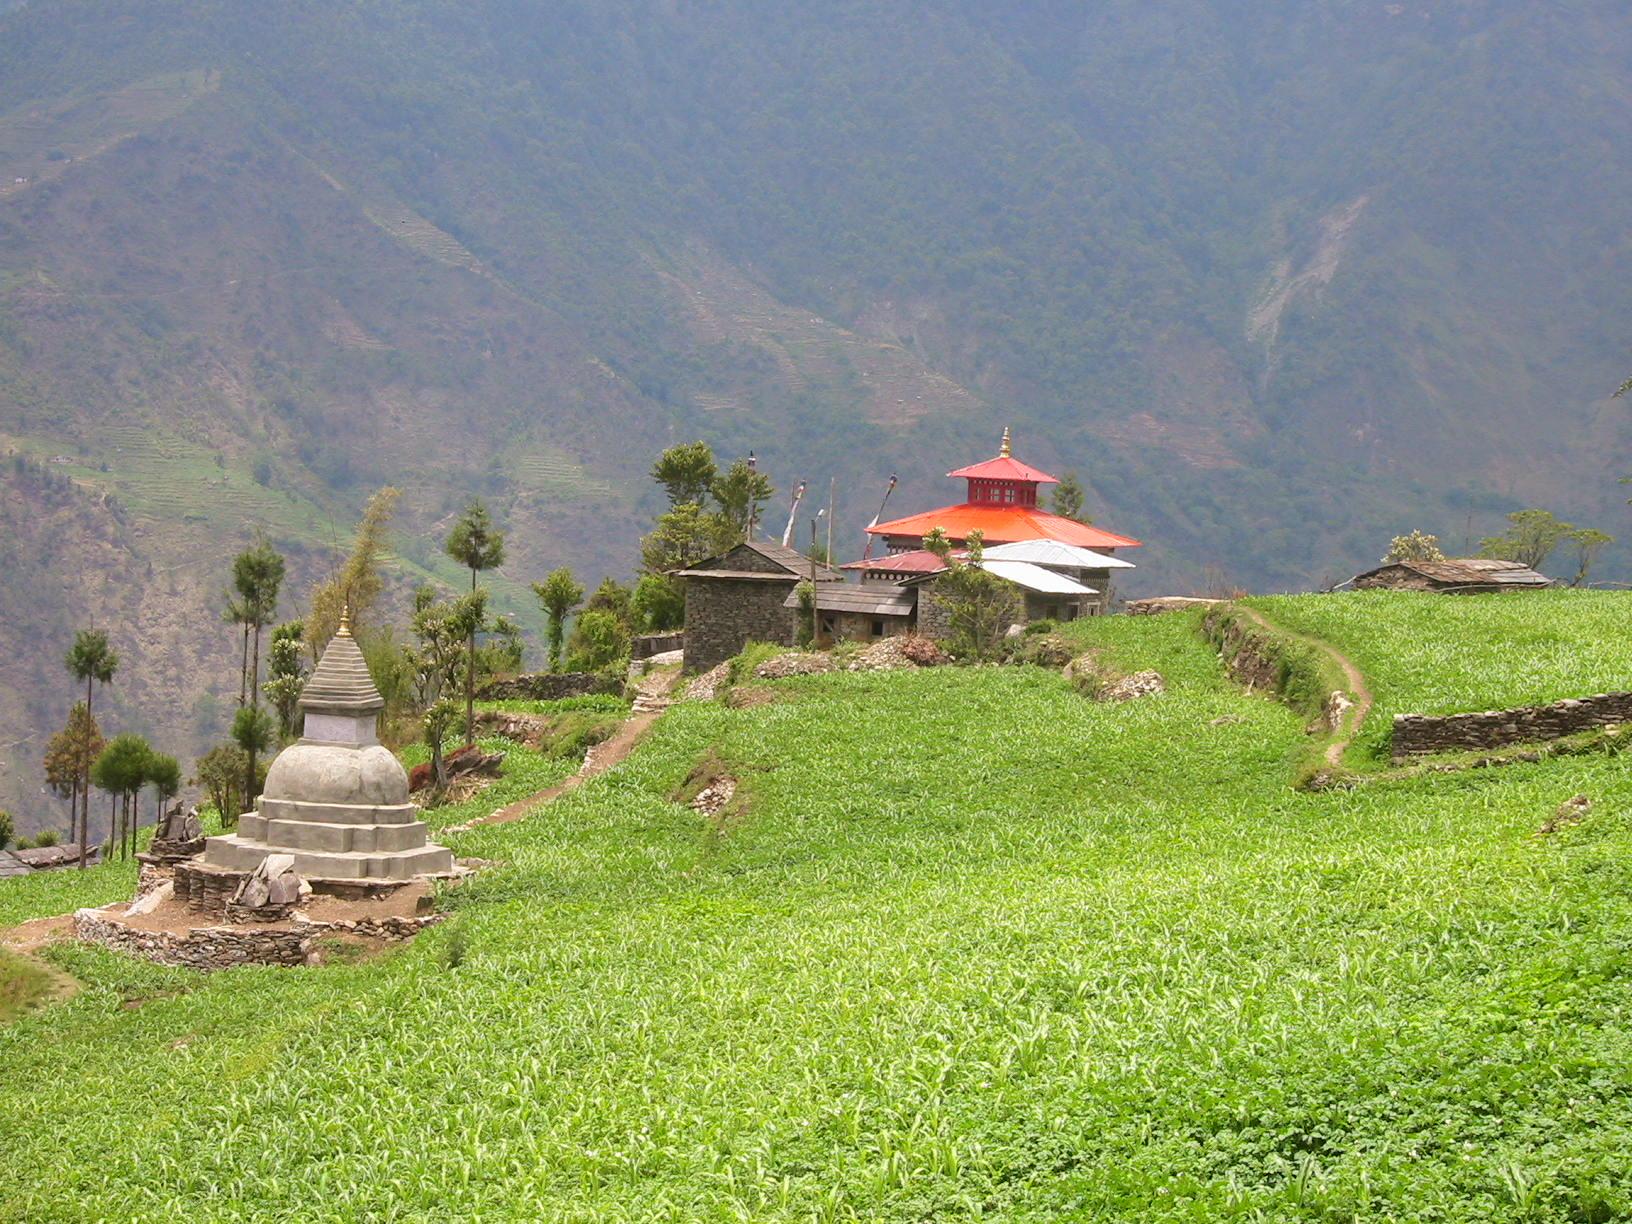 Bupsa Temple